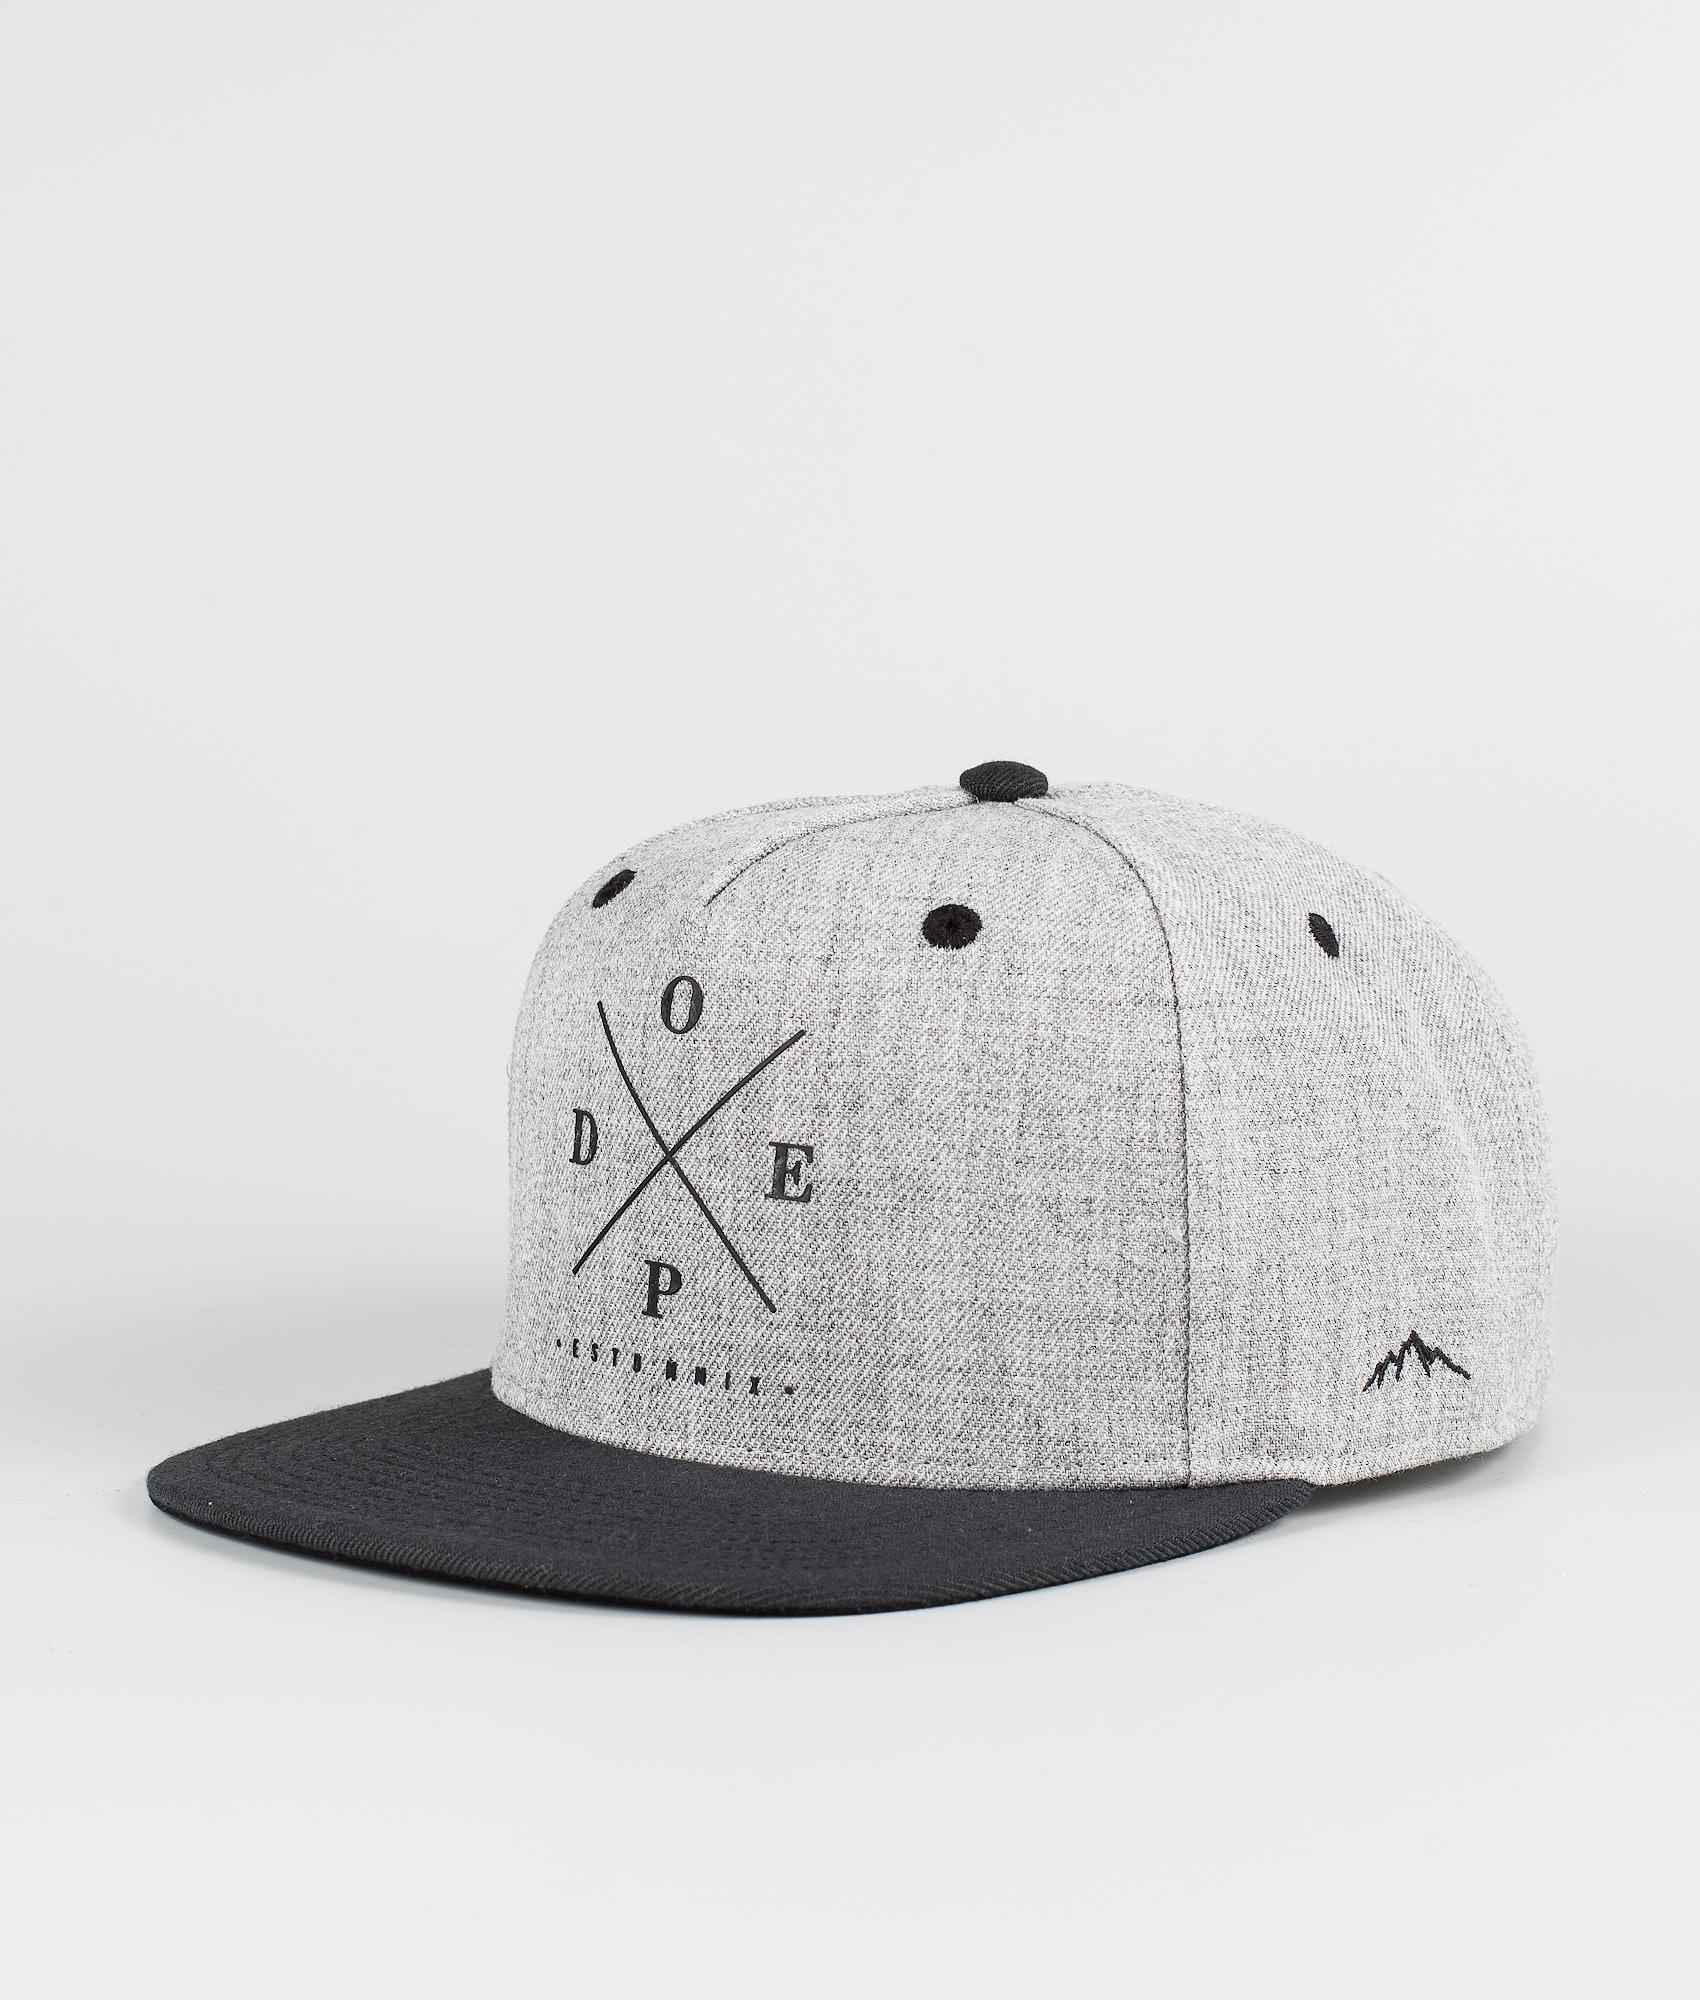 6f52bfa0df4 Streetwear Caps